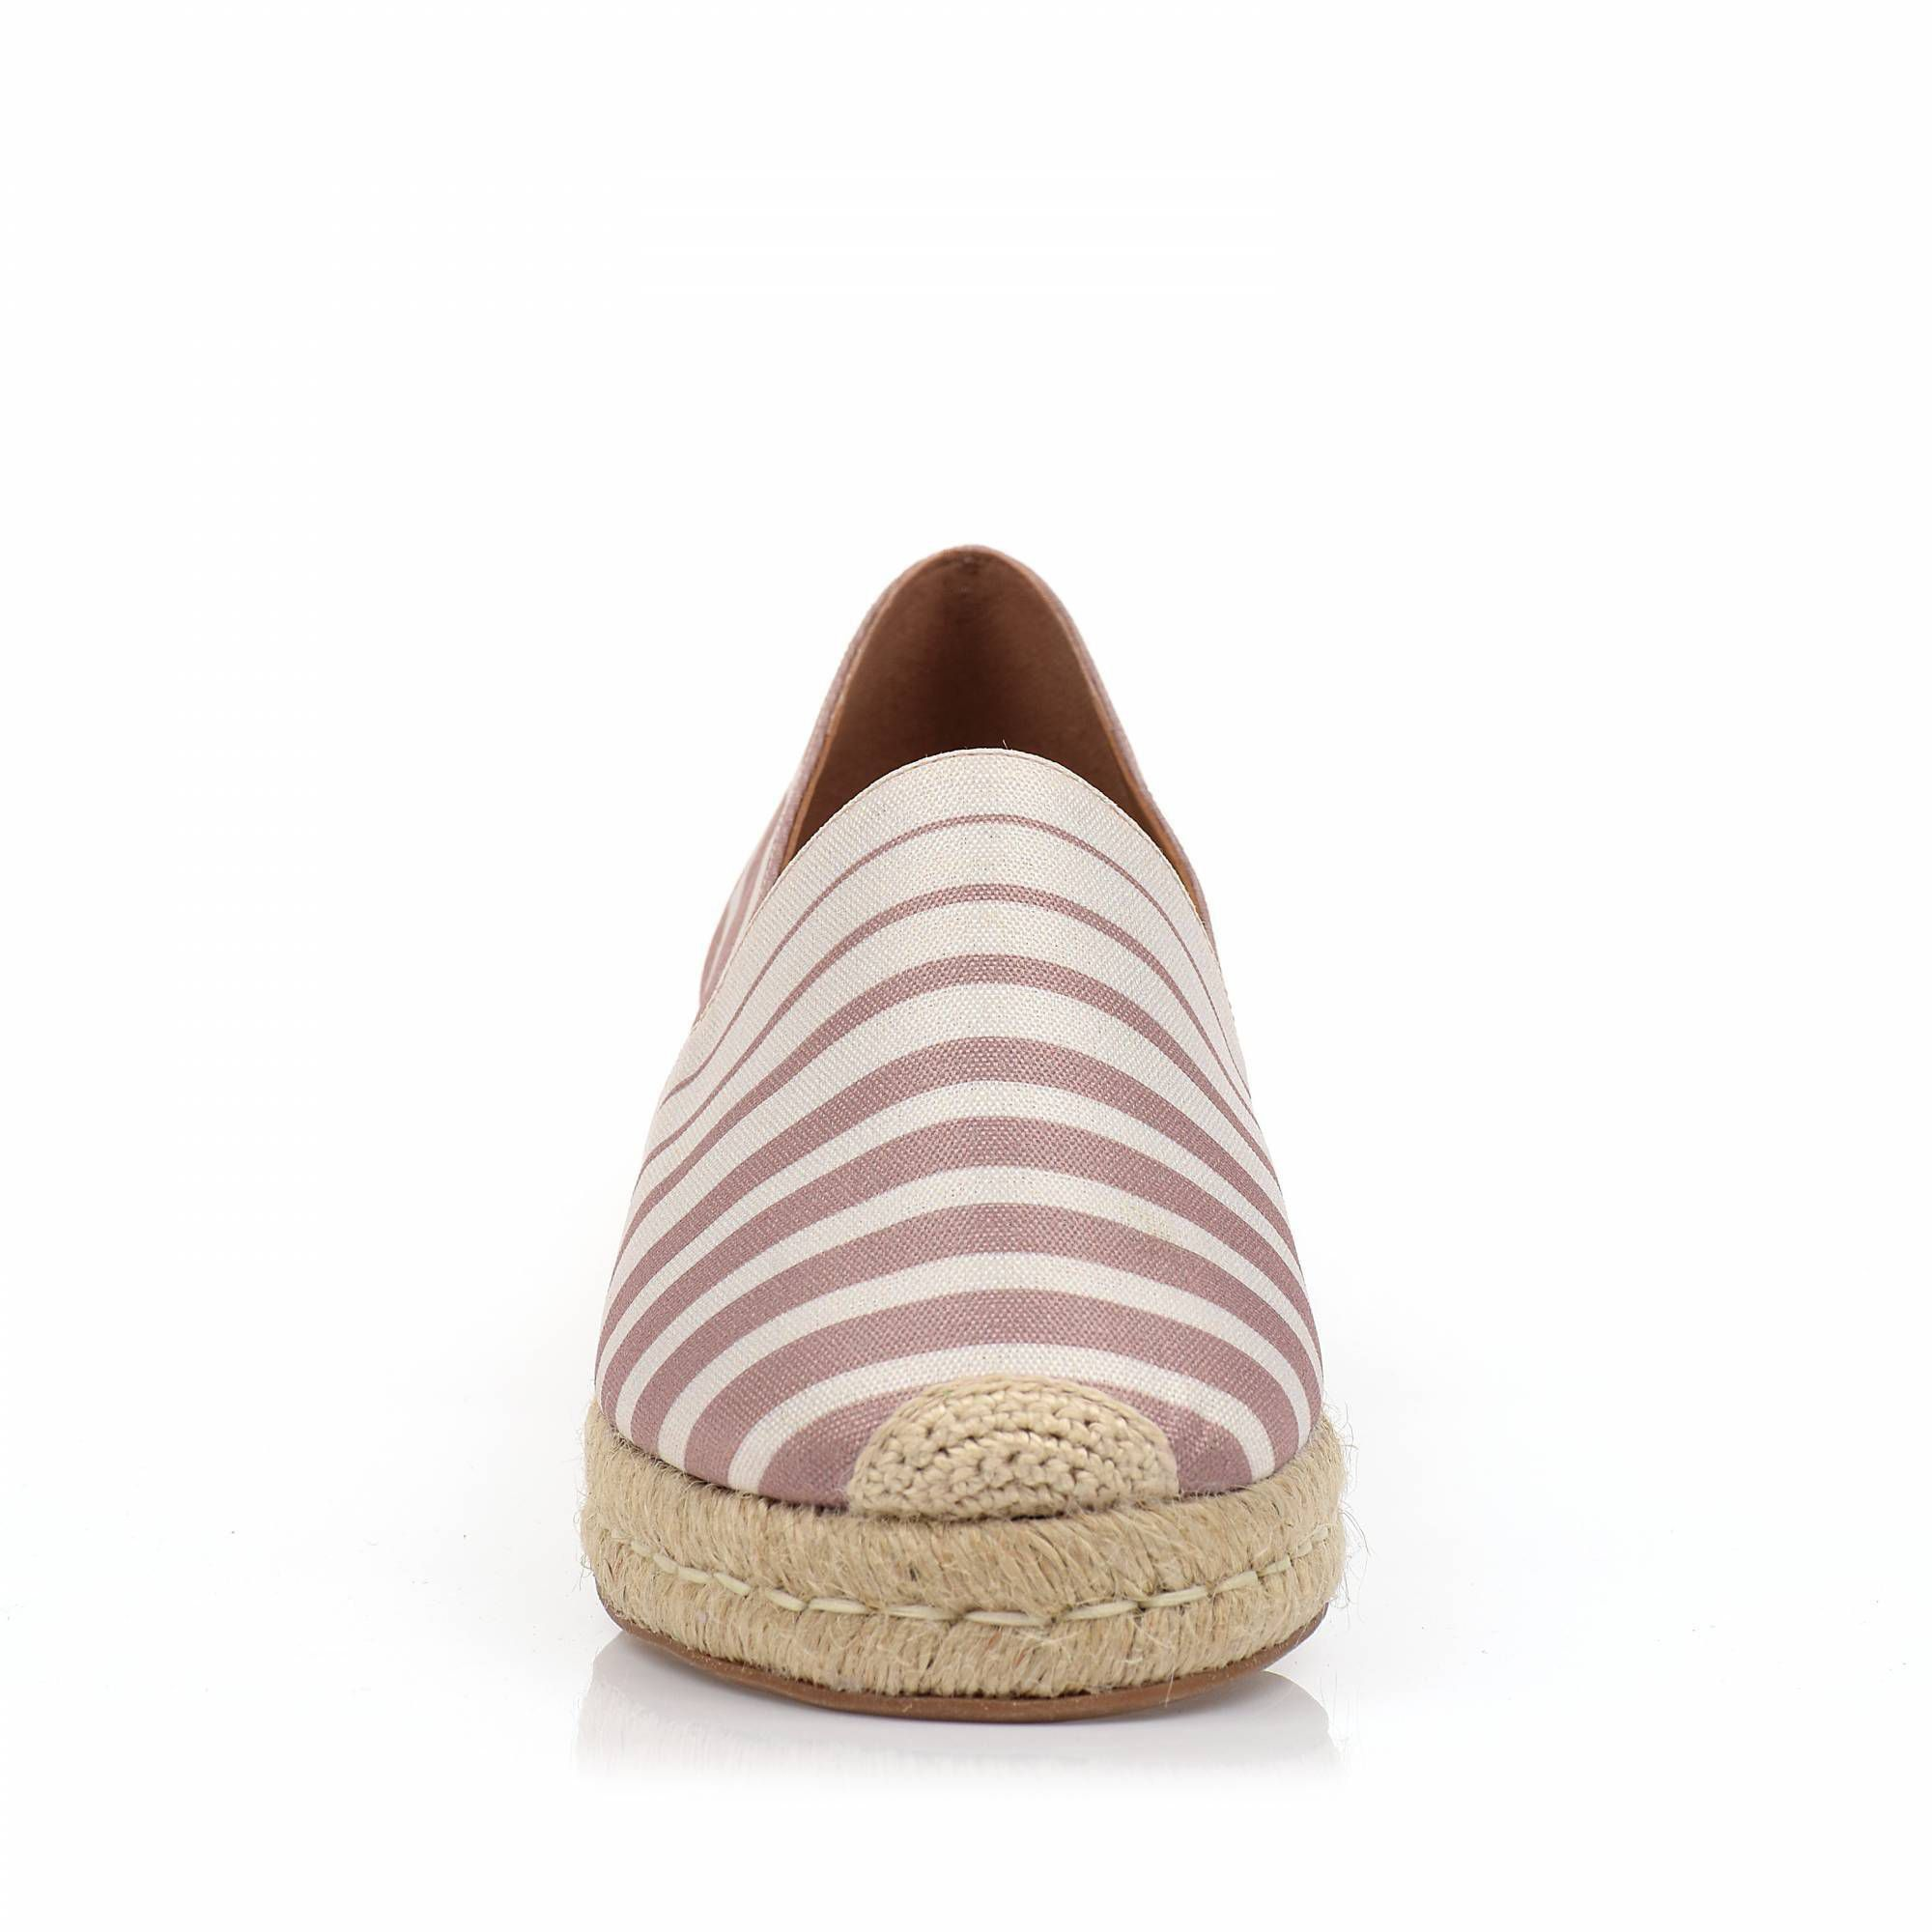 Flats Stripes Nude